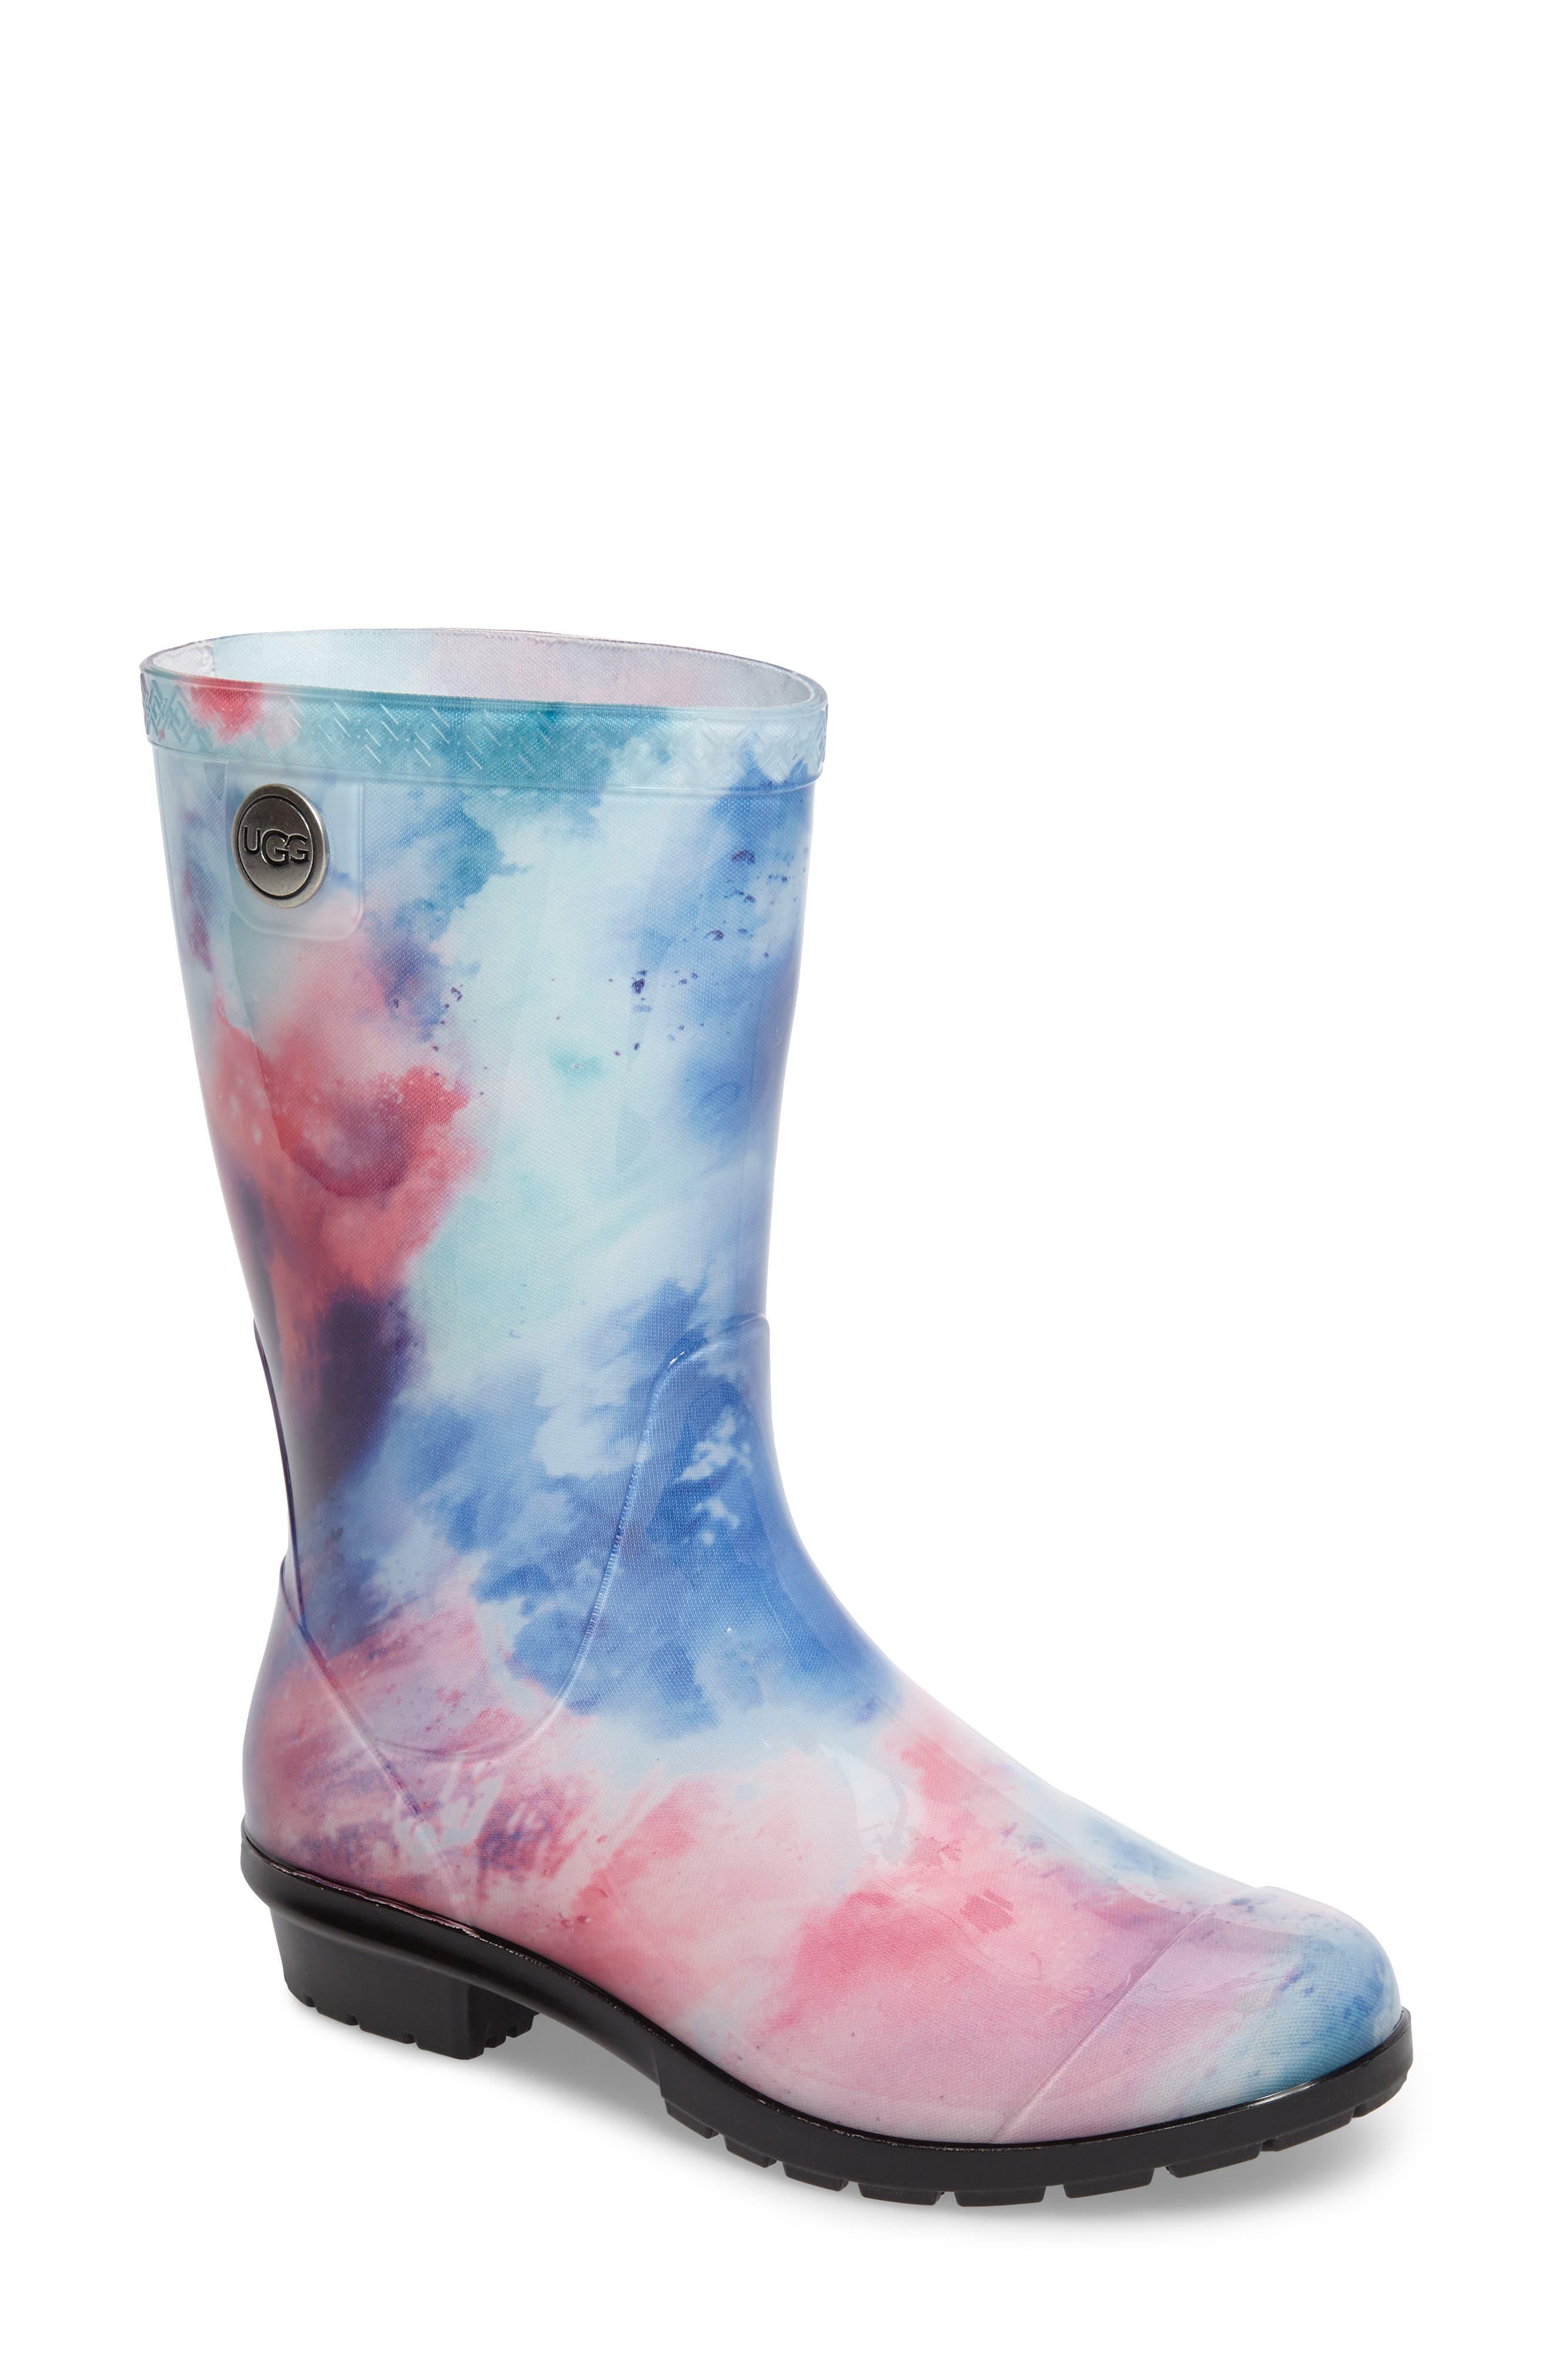 Sienna Watercolor Waterproof Rain Boot,                         Main,                         color, Wild Rose/ Waterfall